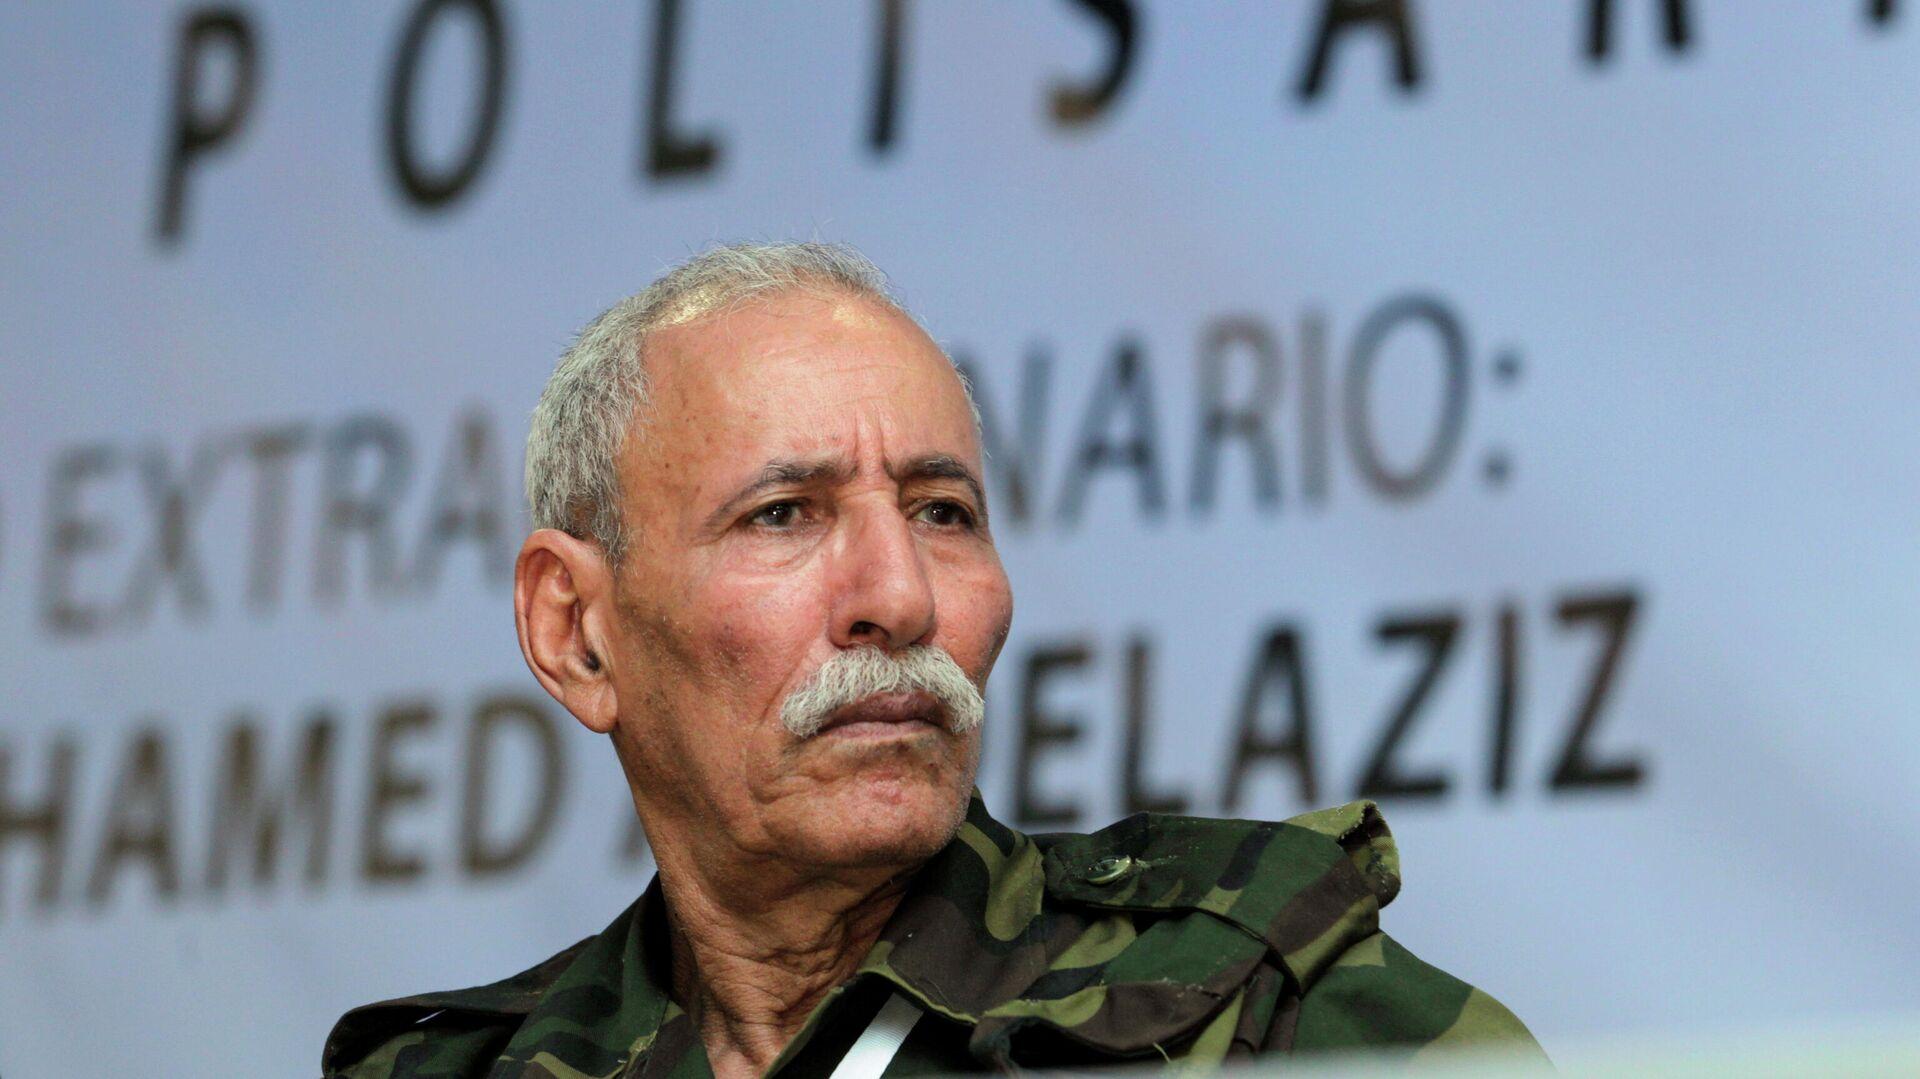 Brahim Ghali, el líder del Frente Polisario - Sputnik Mundo, 1920, 01.06.2021